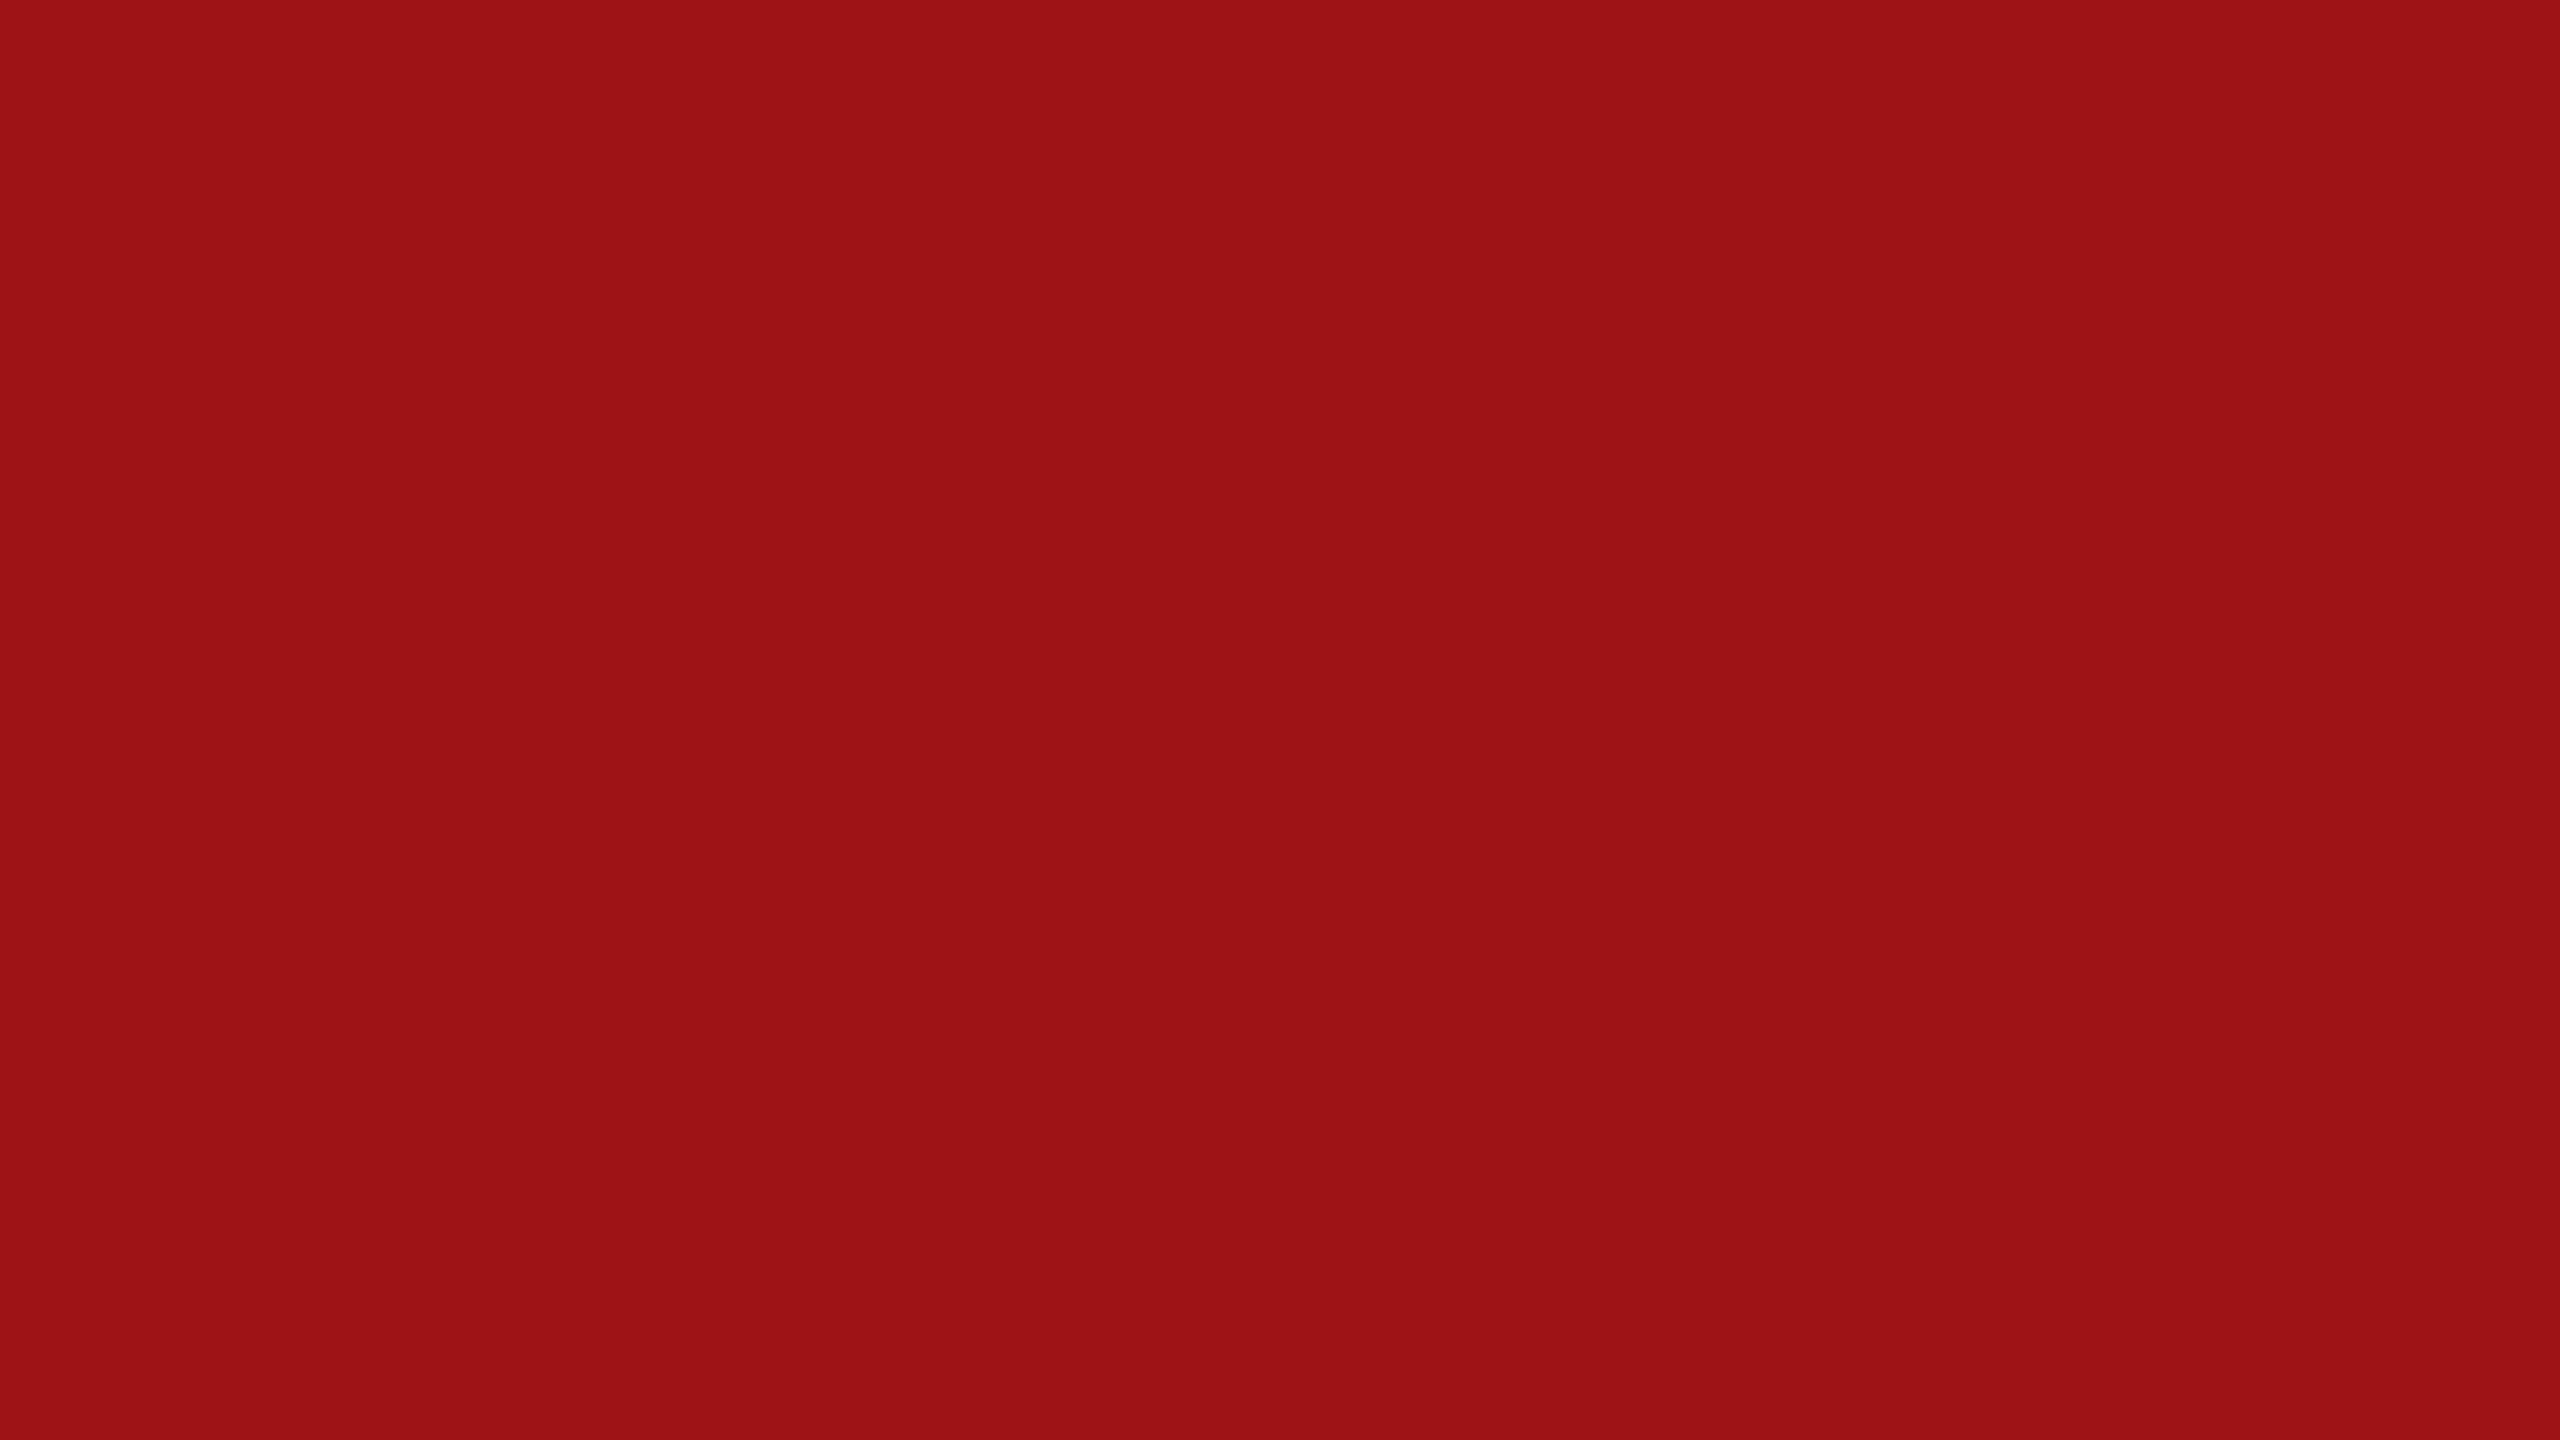 2560x1440 Spartan Crimson Solid Color Background